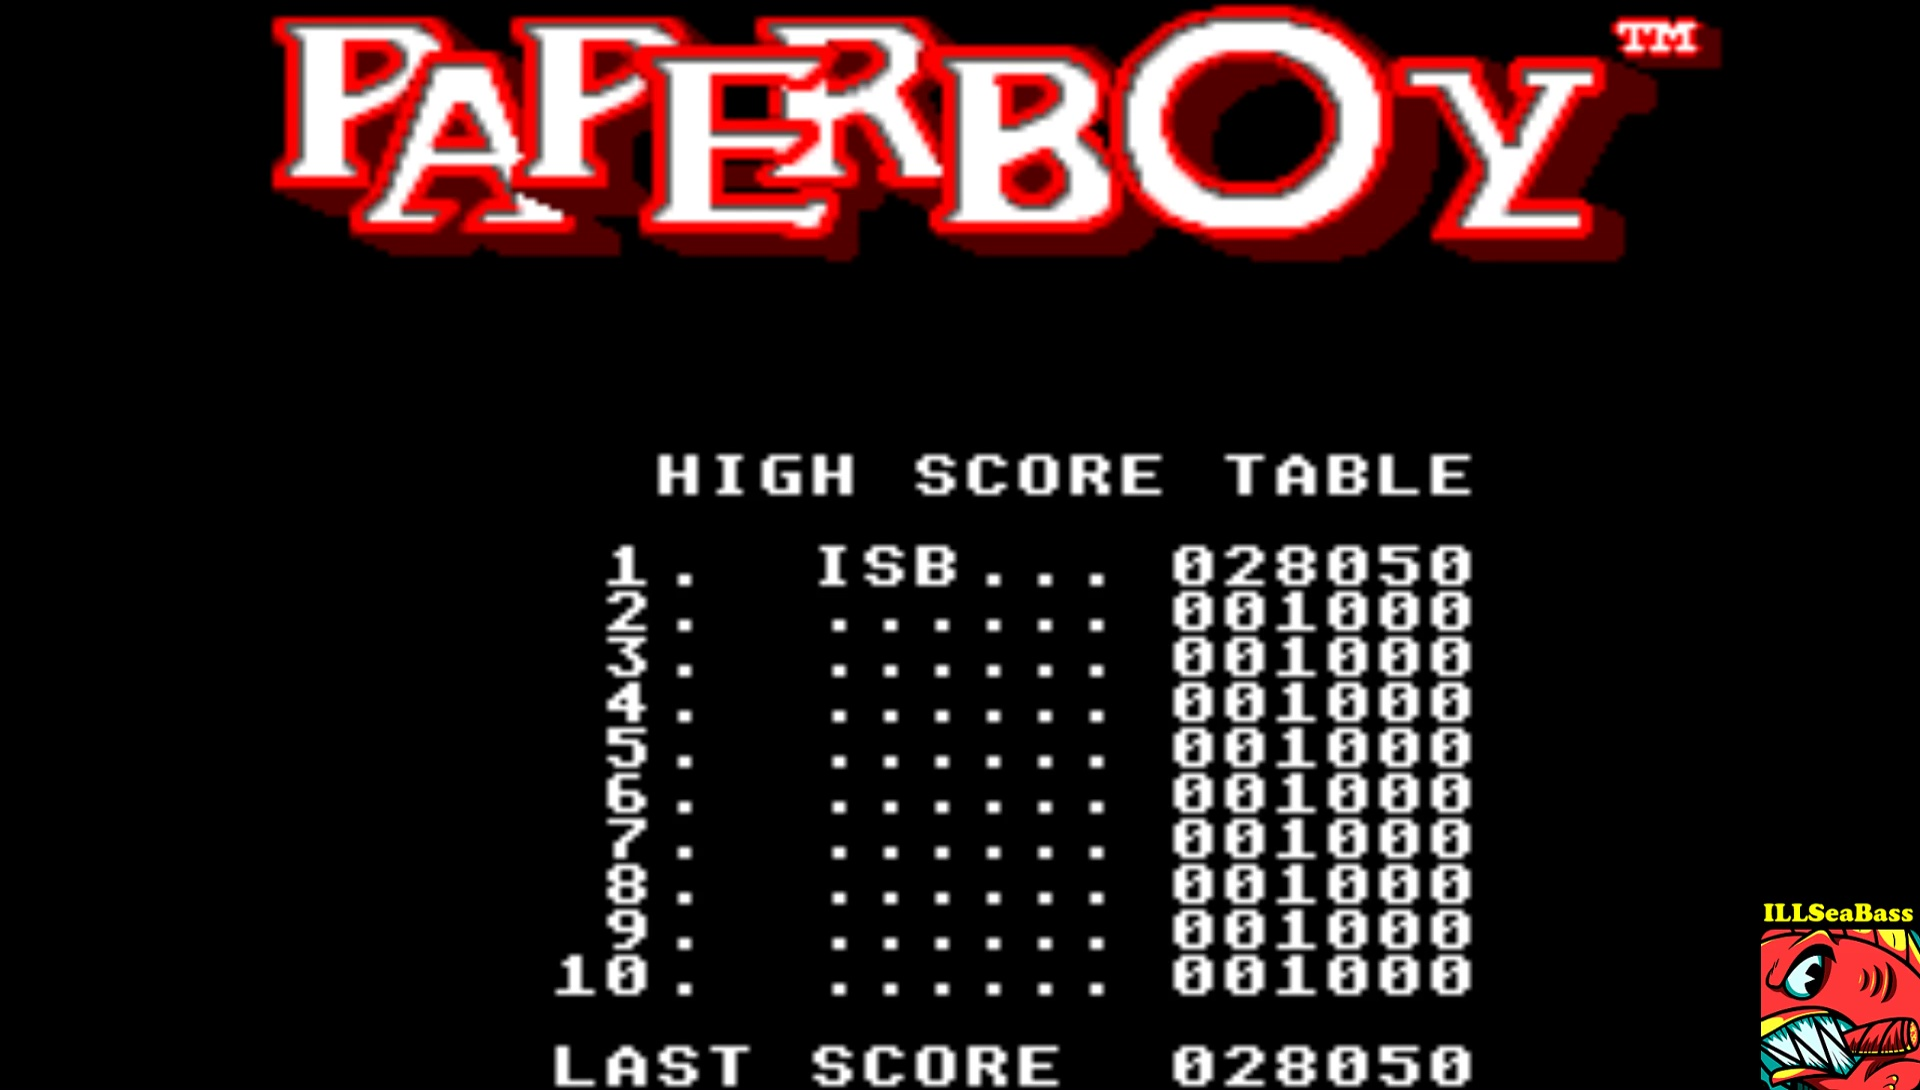 ILLSeaBass: Paperboy [Easy Street] (Sega Master System Emulated) 28,050 points on 2017-03-01 08:50:01